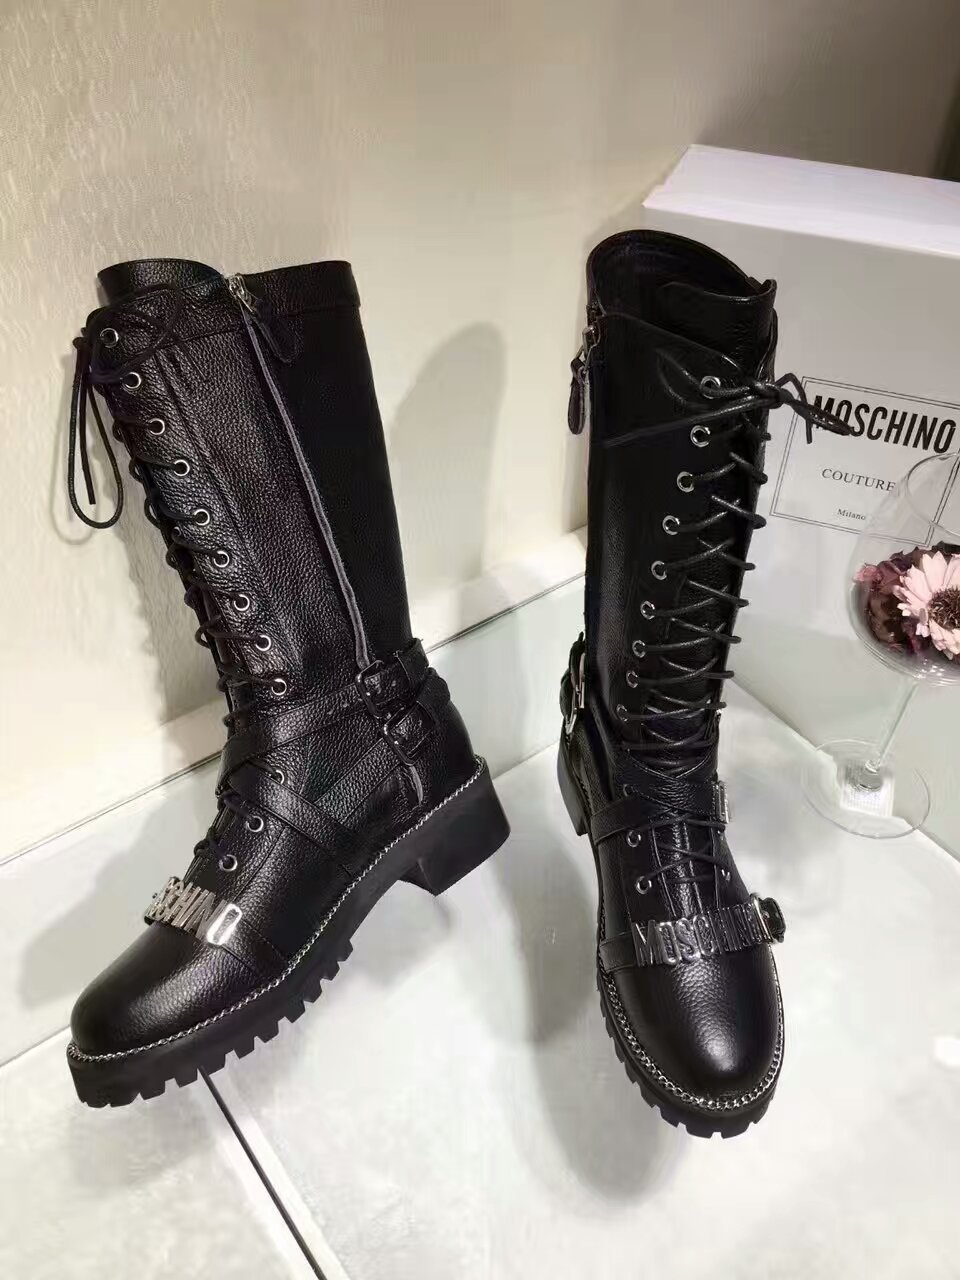 Moschino莫斯奇诺字母骑士军靴 重量级版本